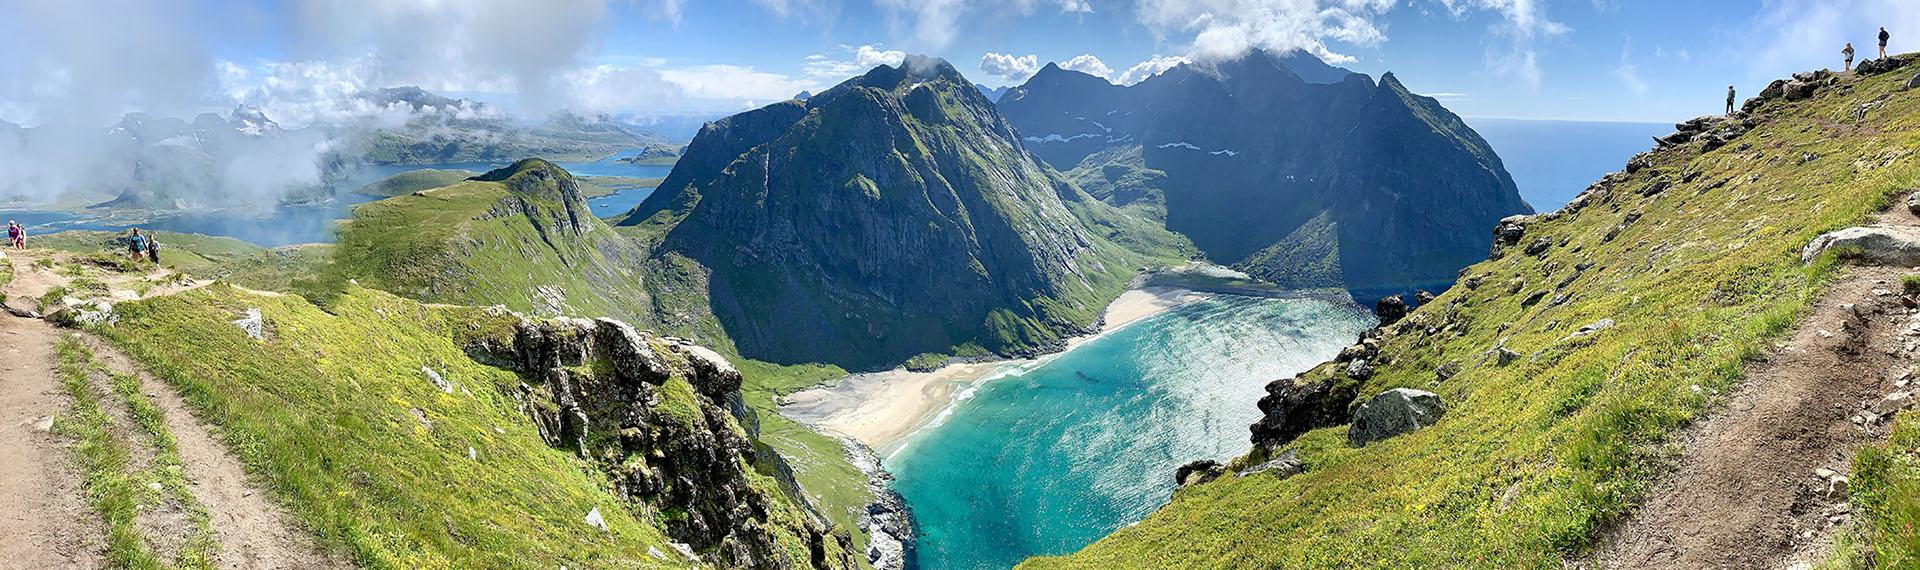 Ryten in Lofoten, Norway